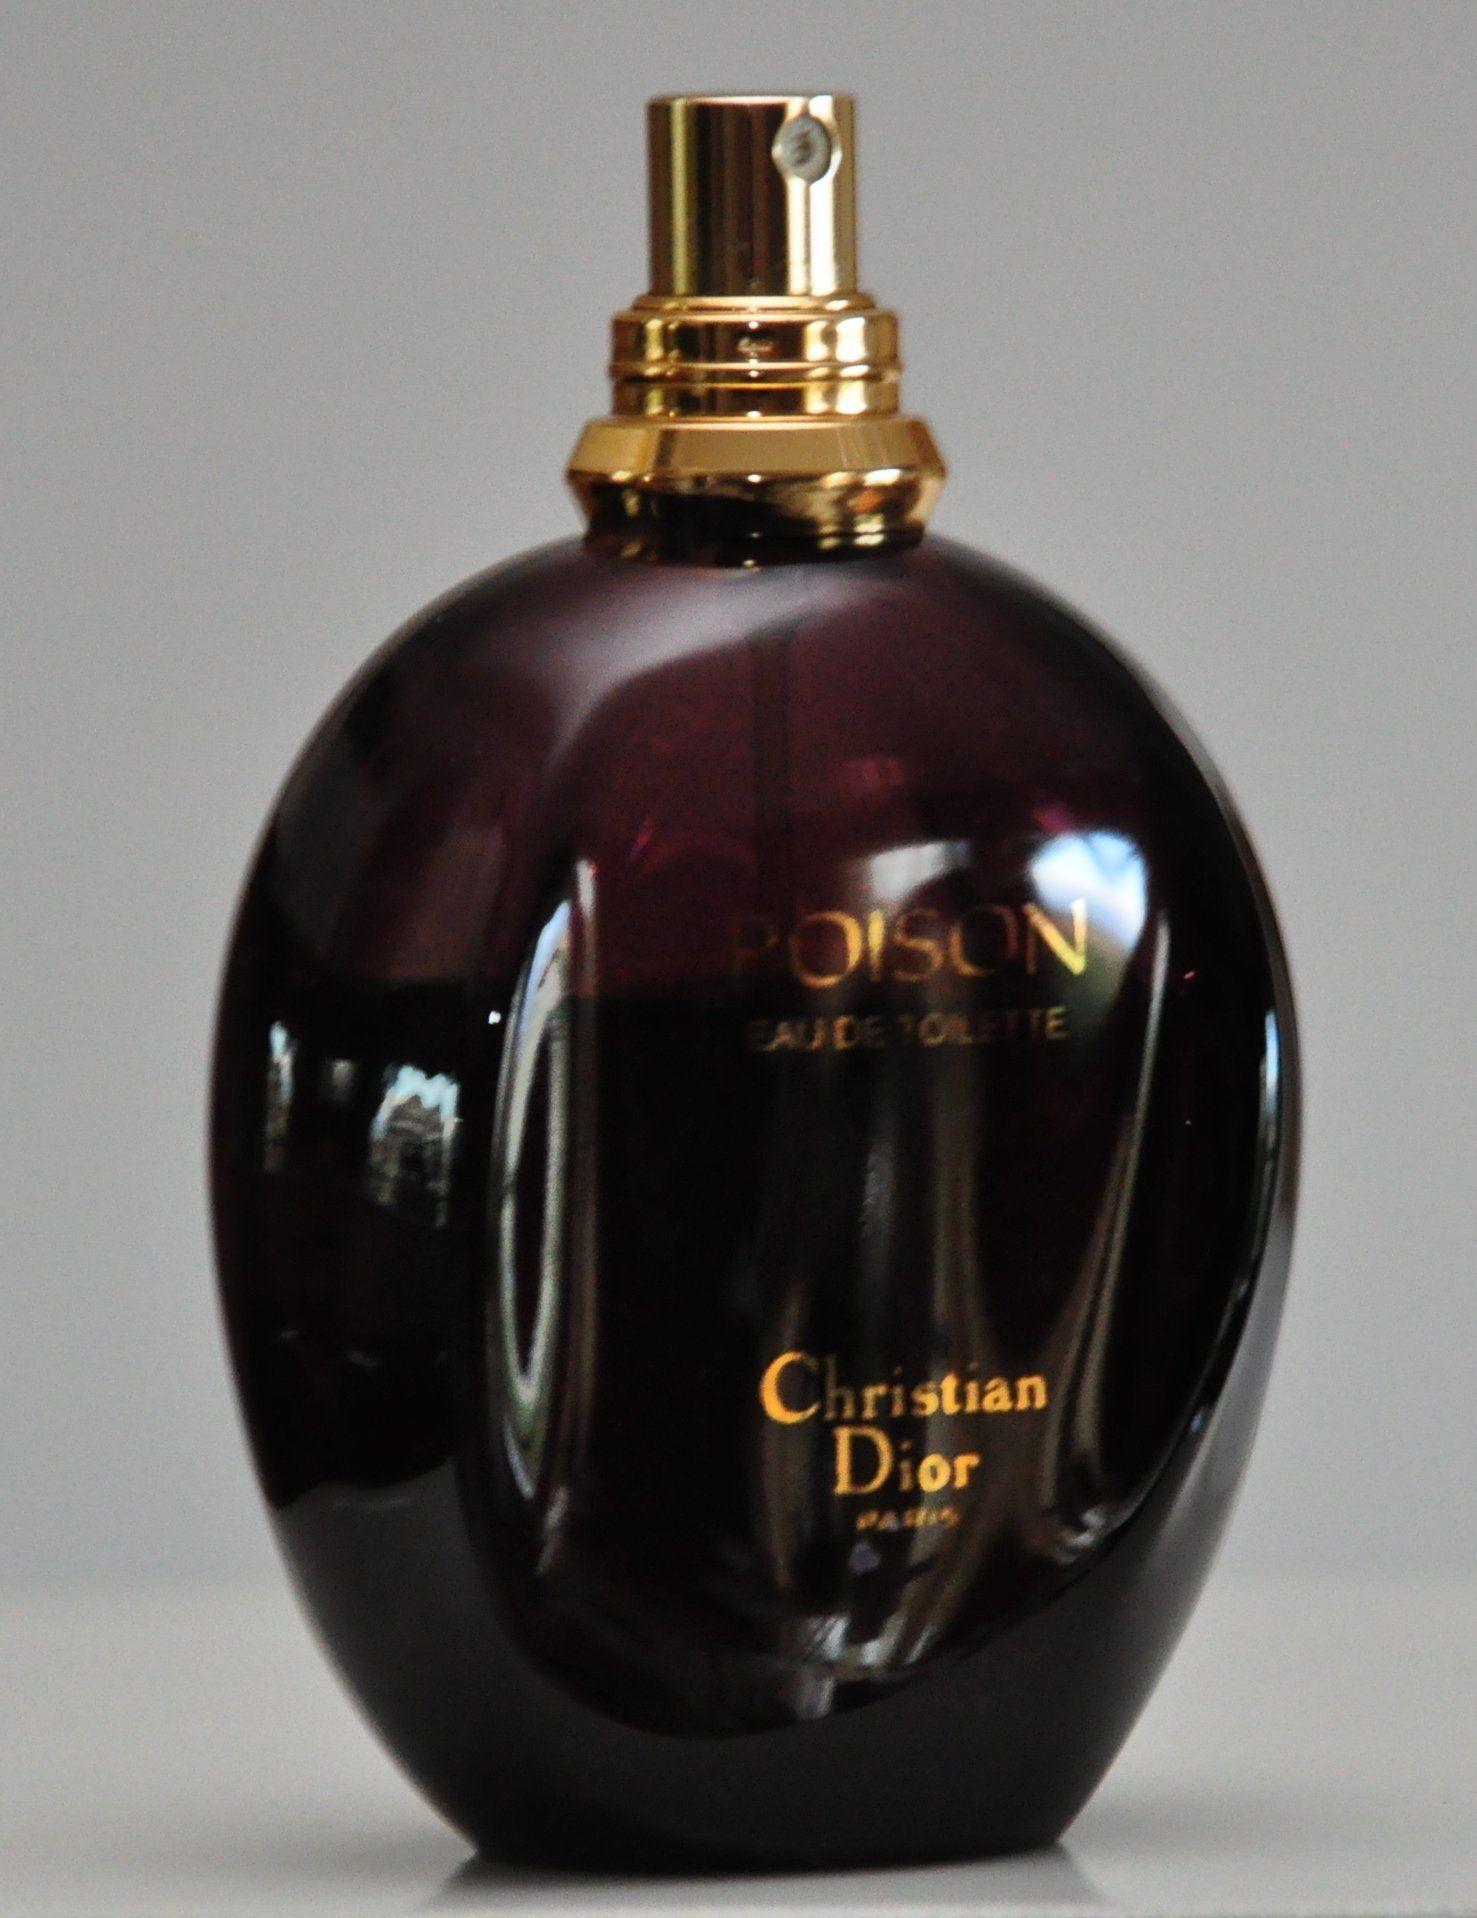 Christian Dior Poison Eau De Toilette Edt Spray 100ML 3 3 Fl